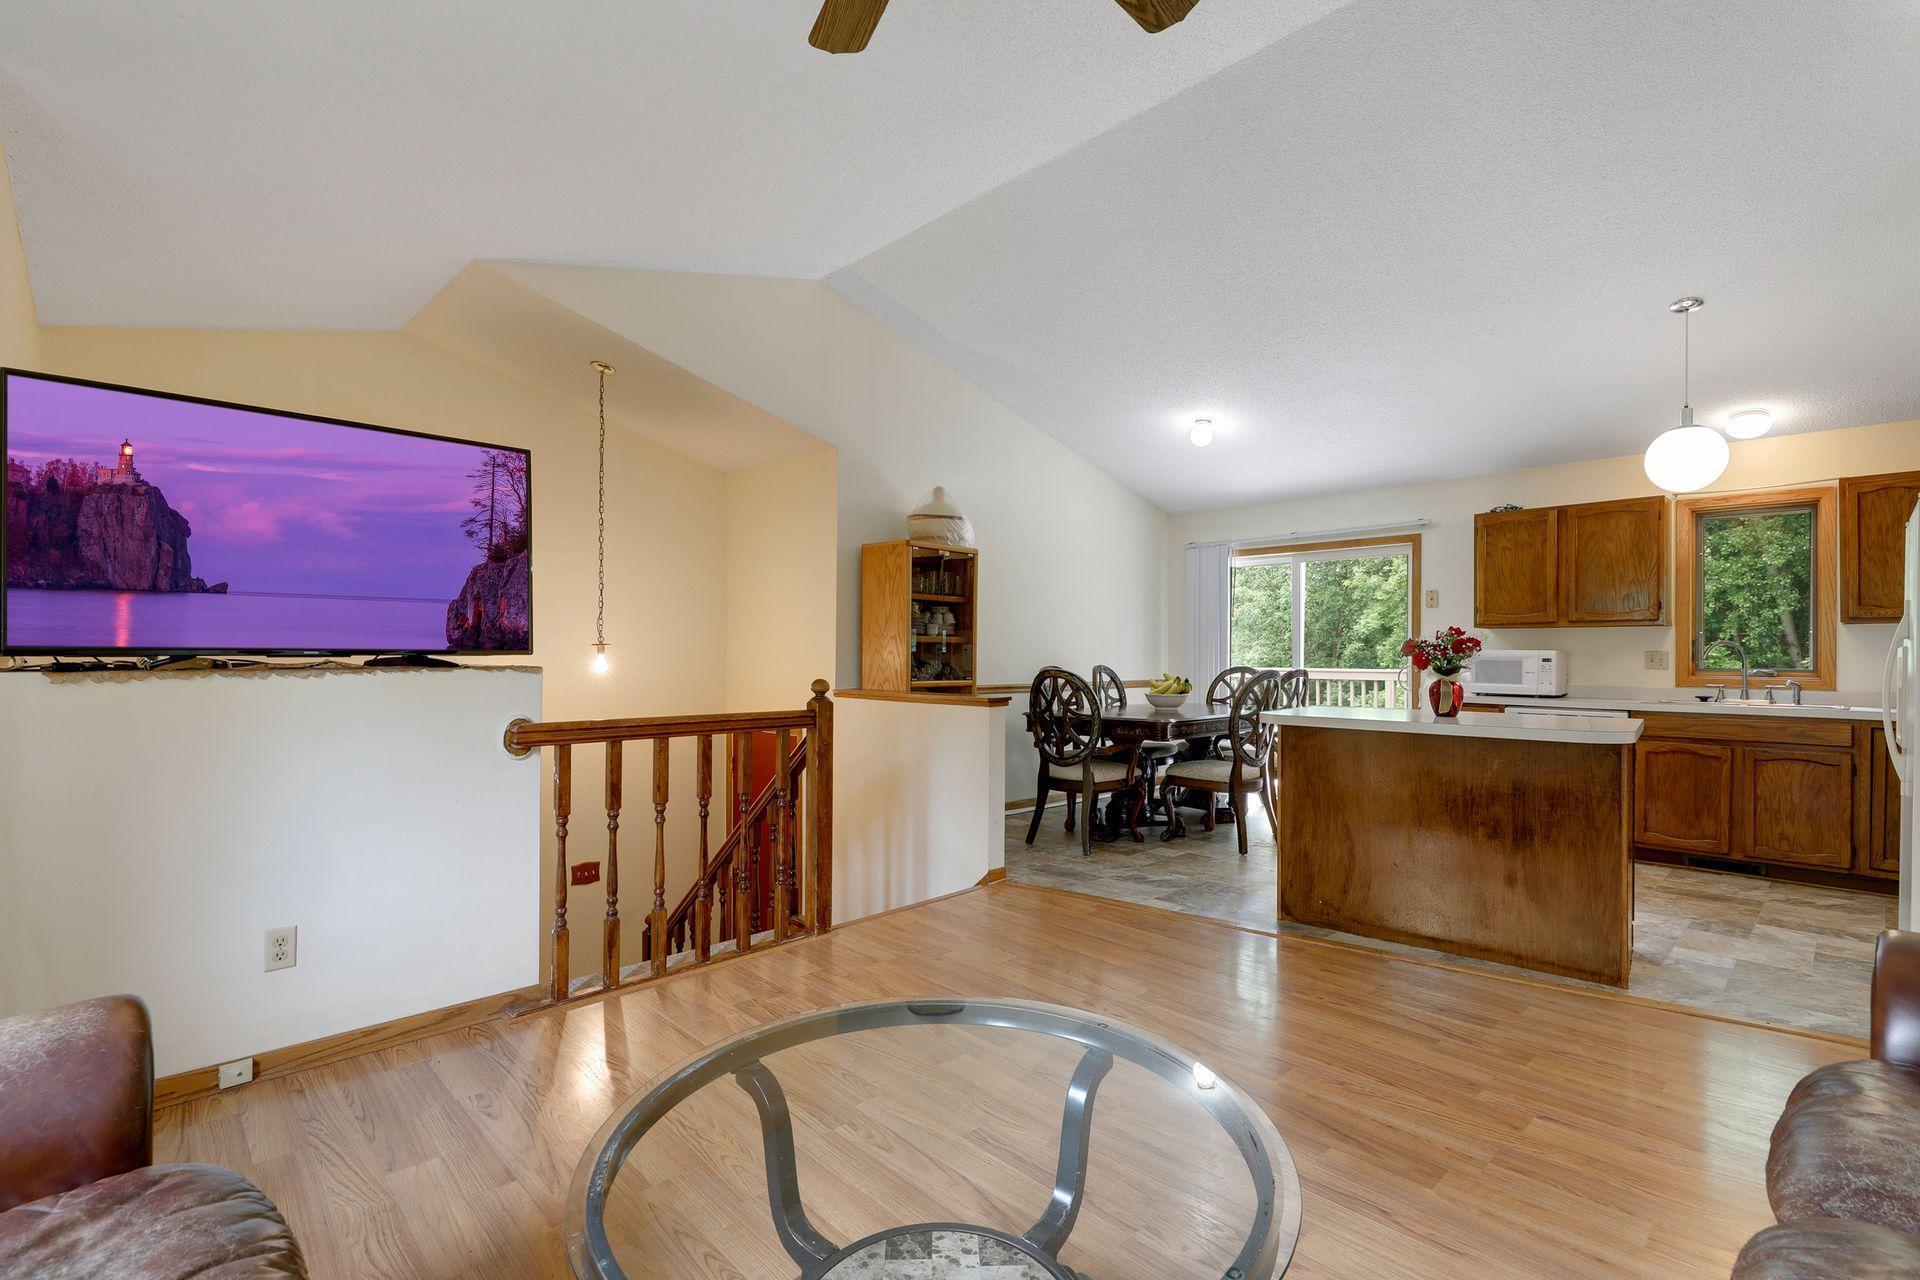 1339 Granite Lane N Property Photo - Oakdale, MN real estate listing